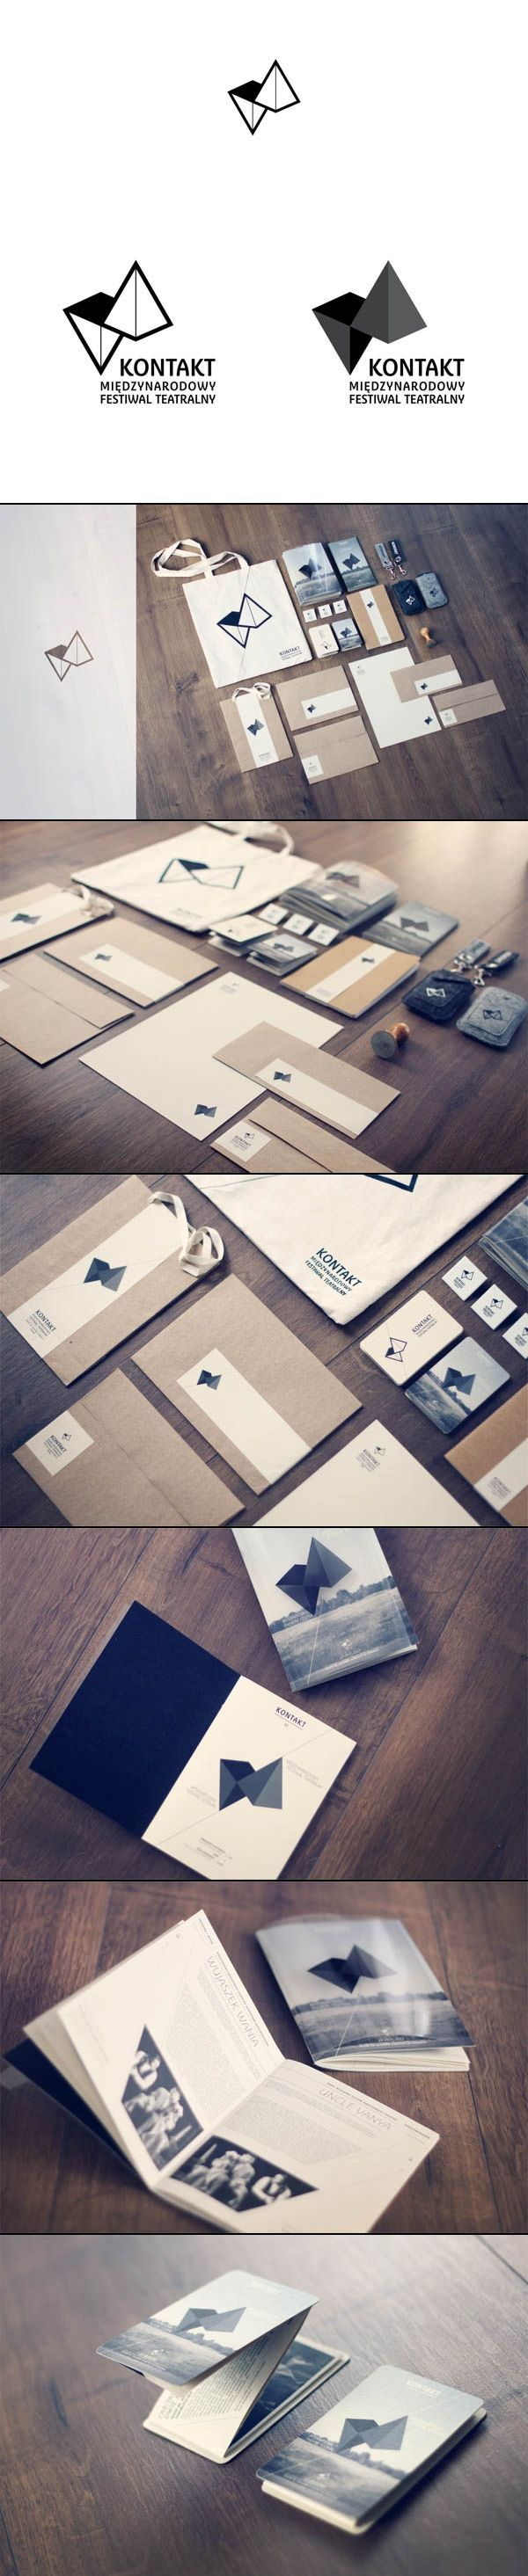 http://www.isharearena.com/creative/inspiration/50-brand-identity-design-examples-impress/